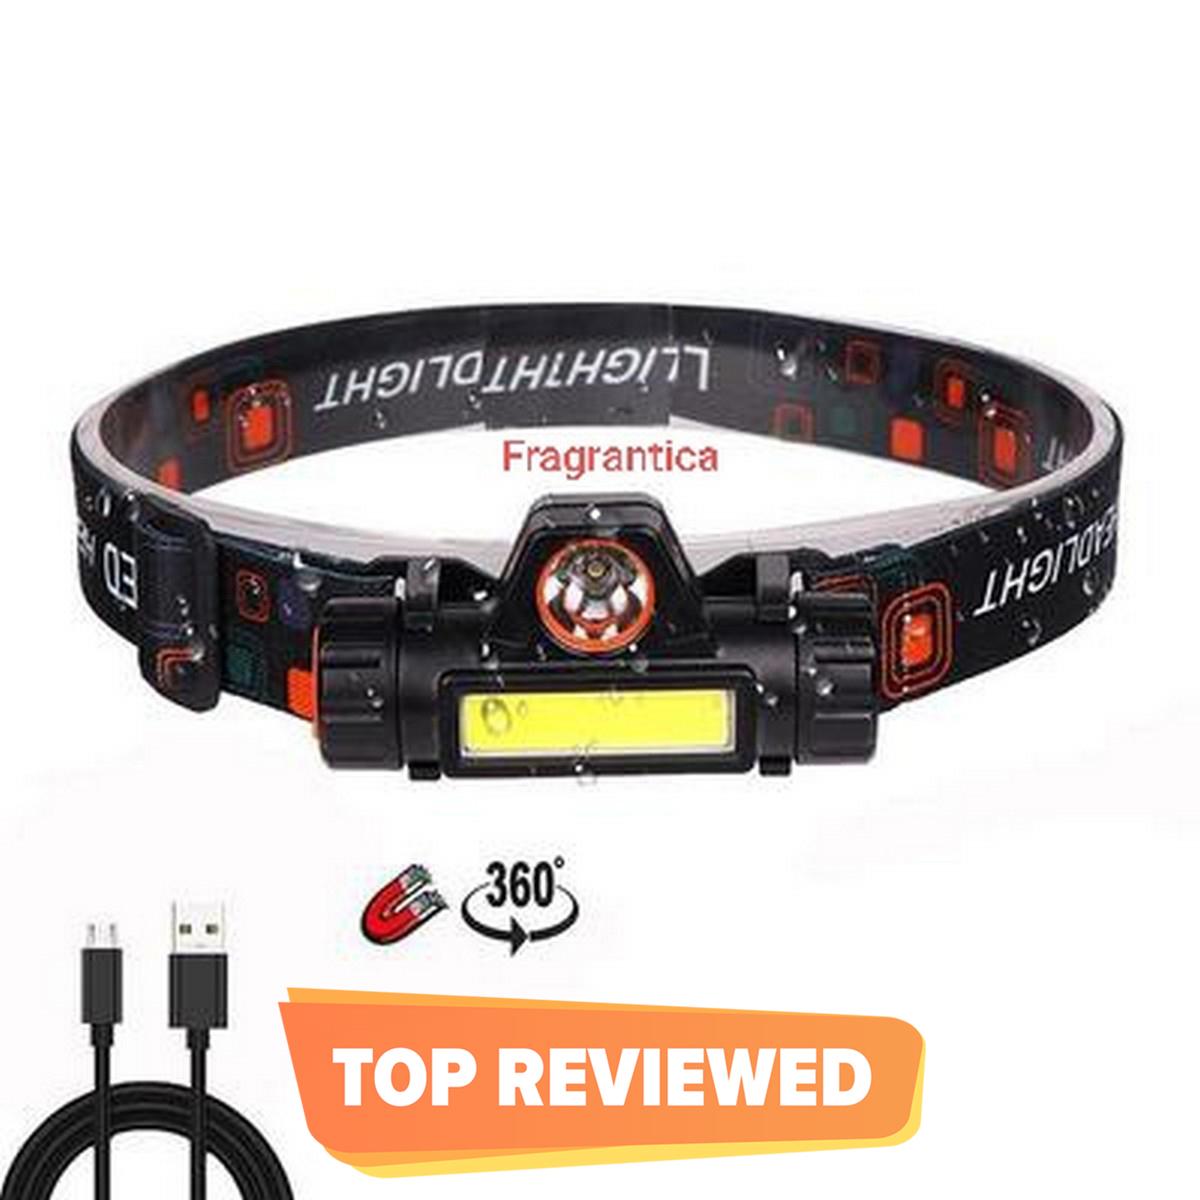 Mini High Power LED Headlamp Built-in Battery T6+COB USB Rechargeable Headlight Waterproof Head Torch Head Lamp